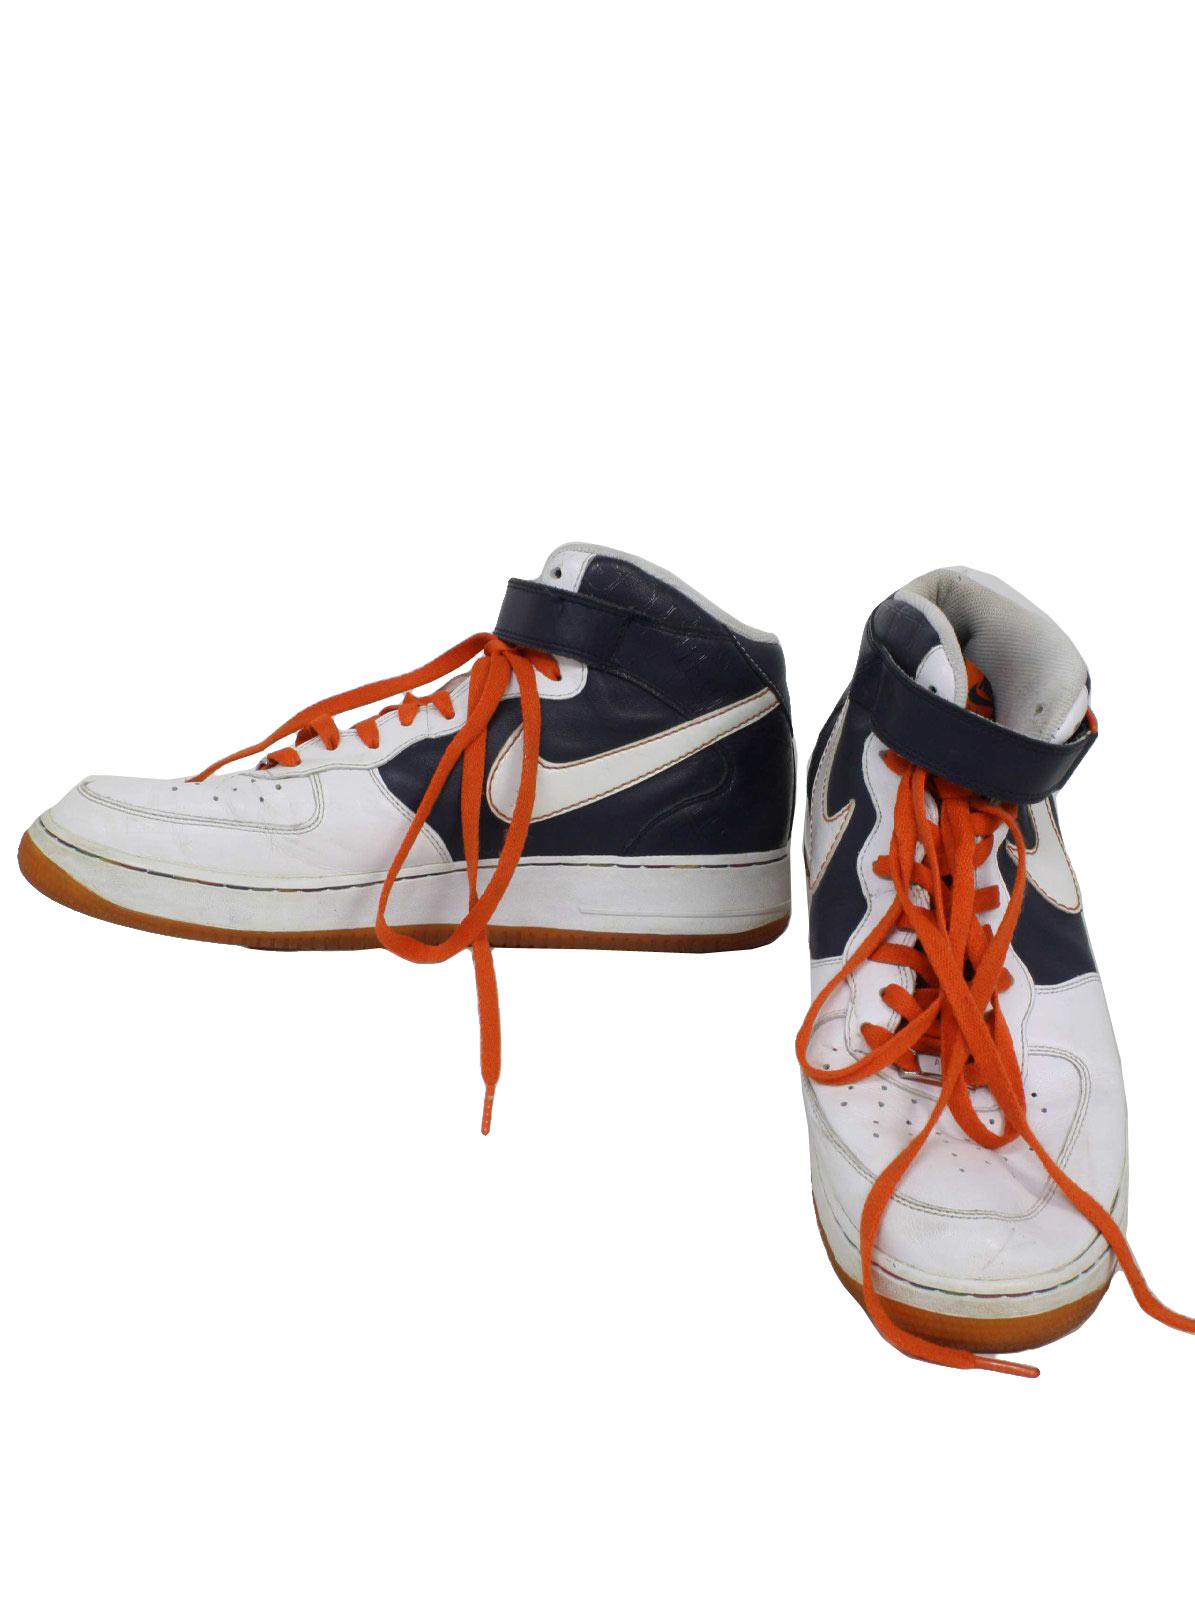 negli anni '90 le scarpe (nike air force 1): 90  nike air force 1 uomini blu